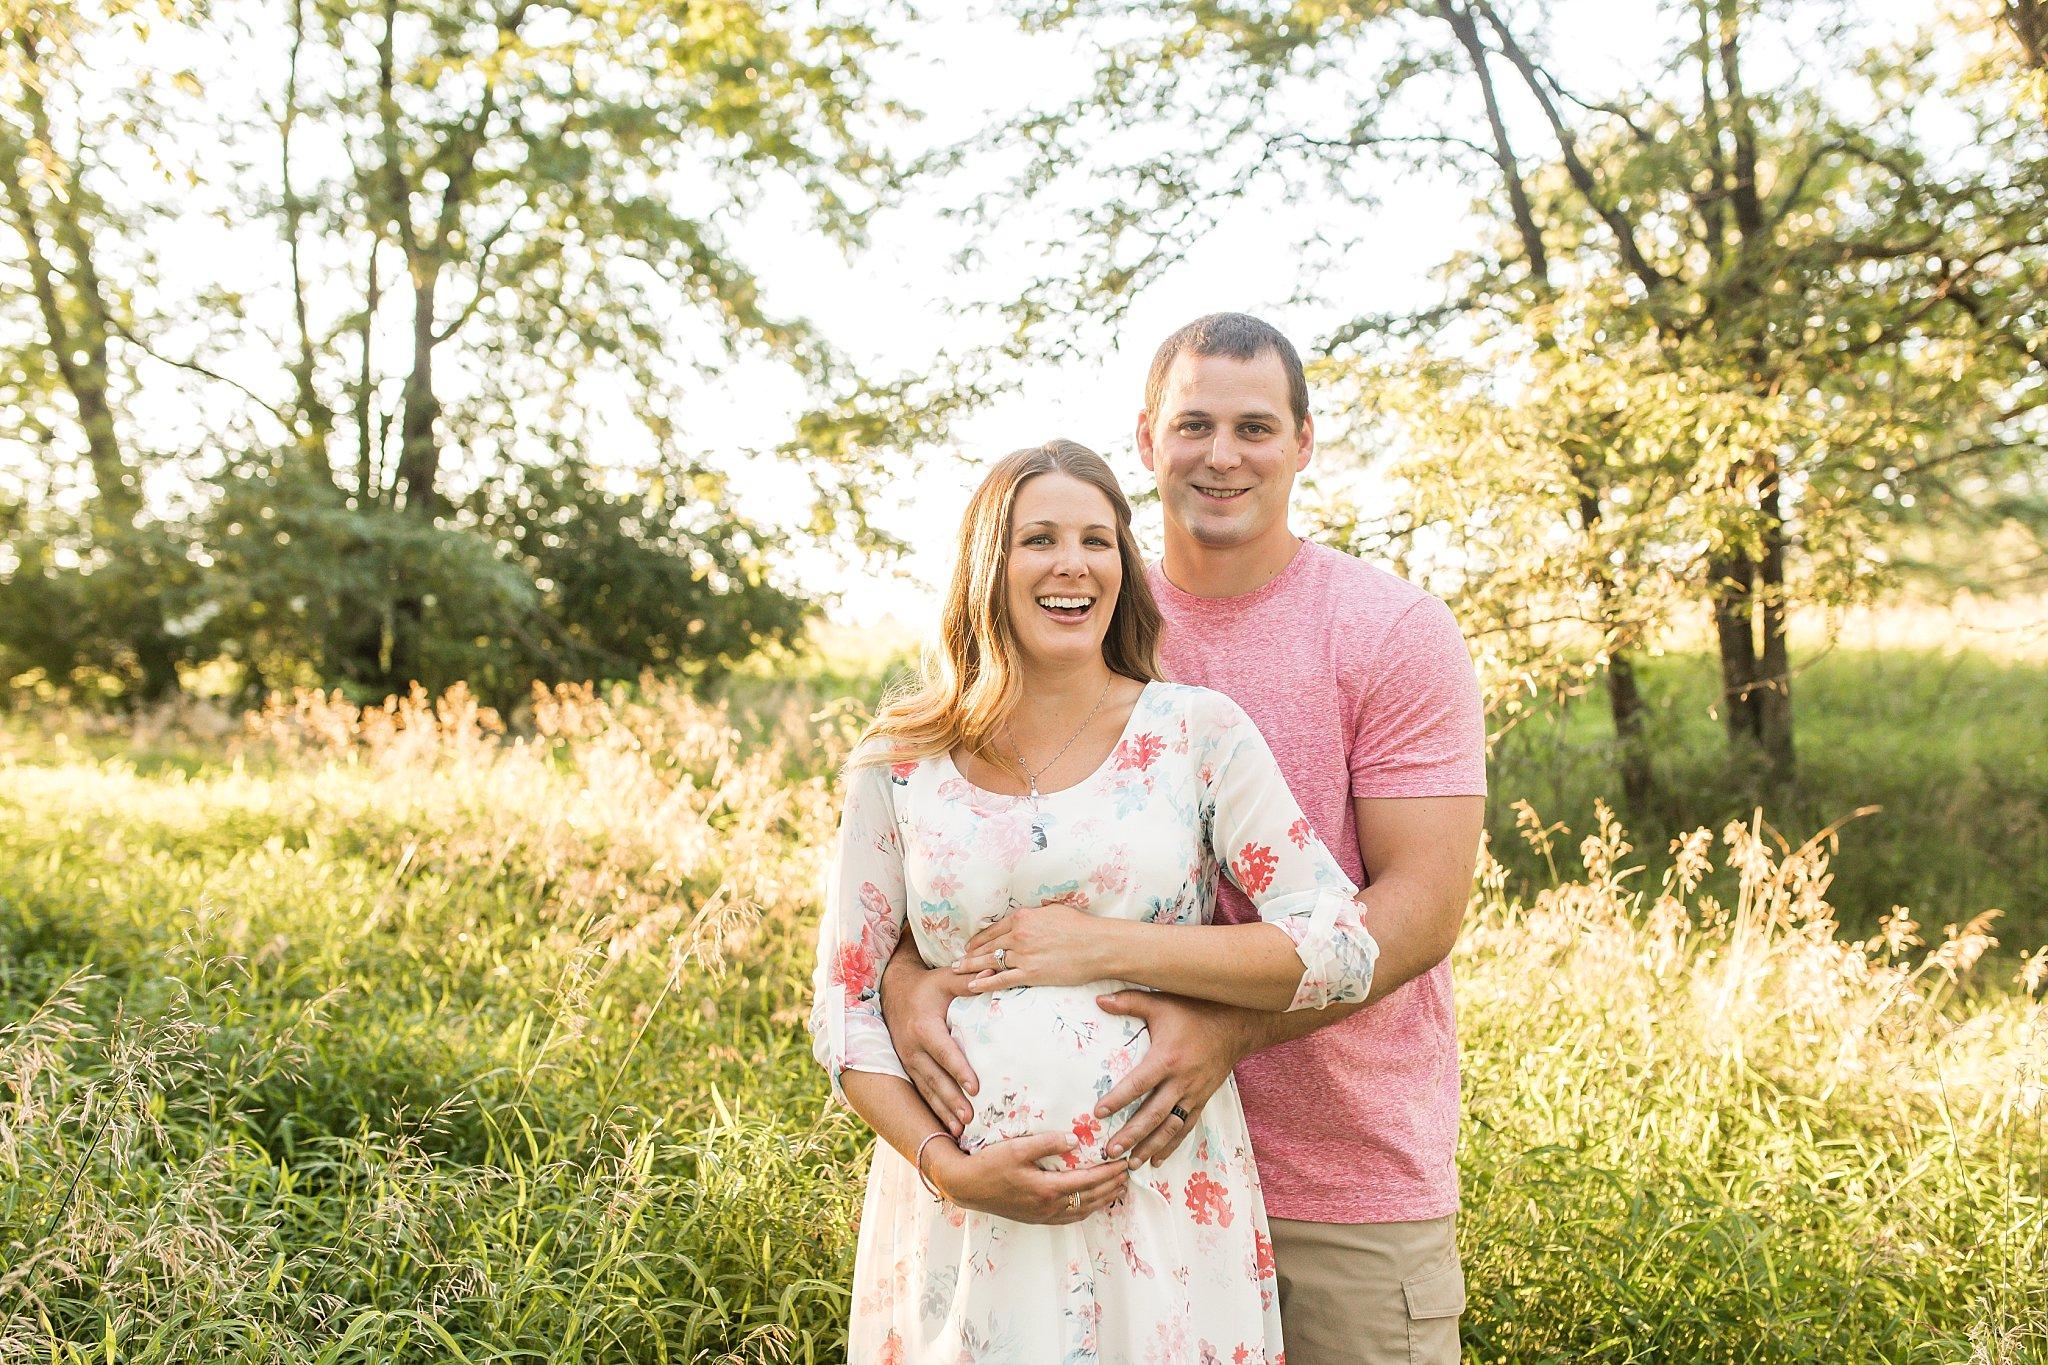 Allentown Maternity Photographer